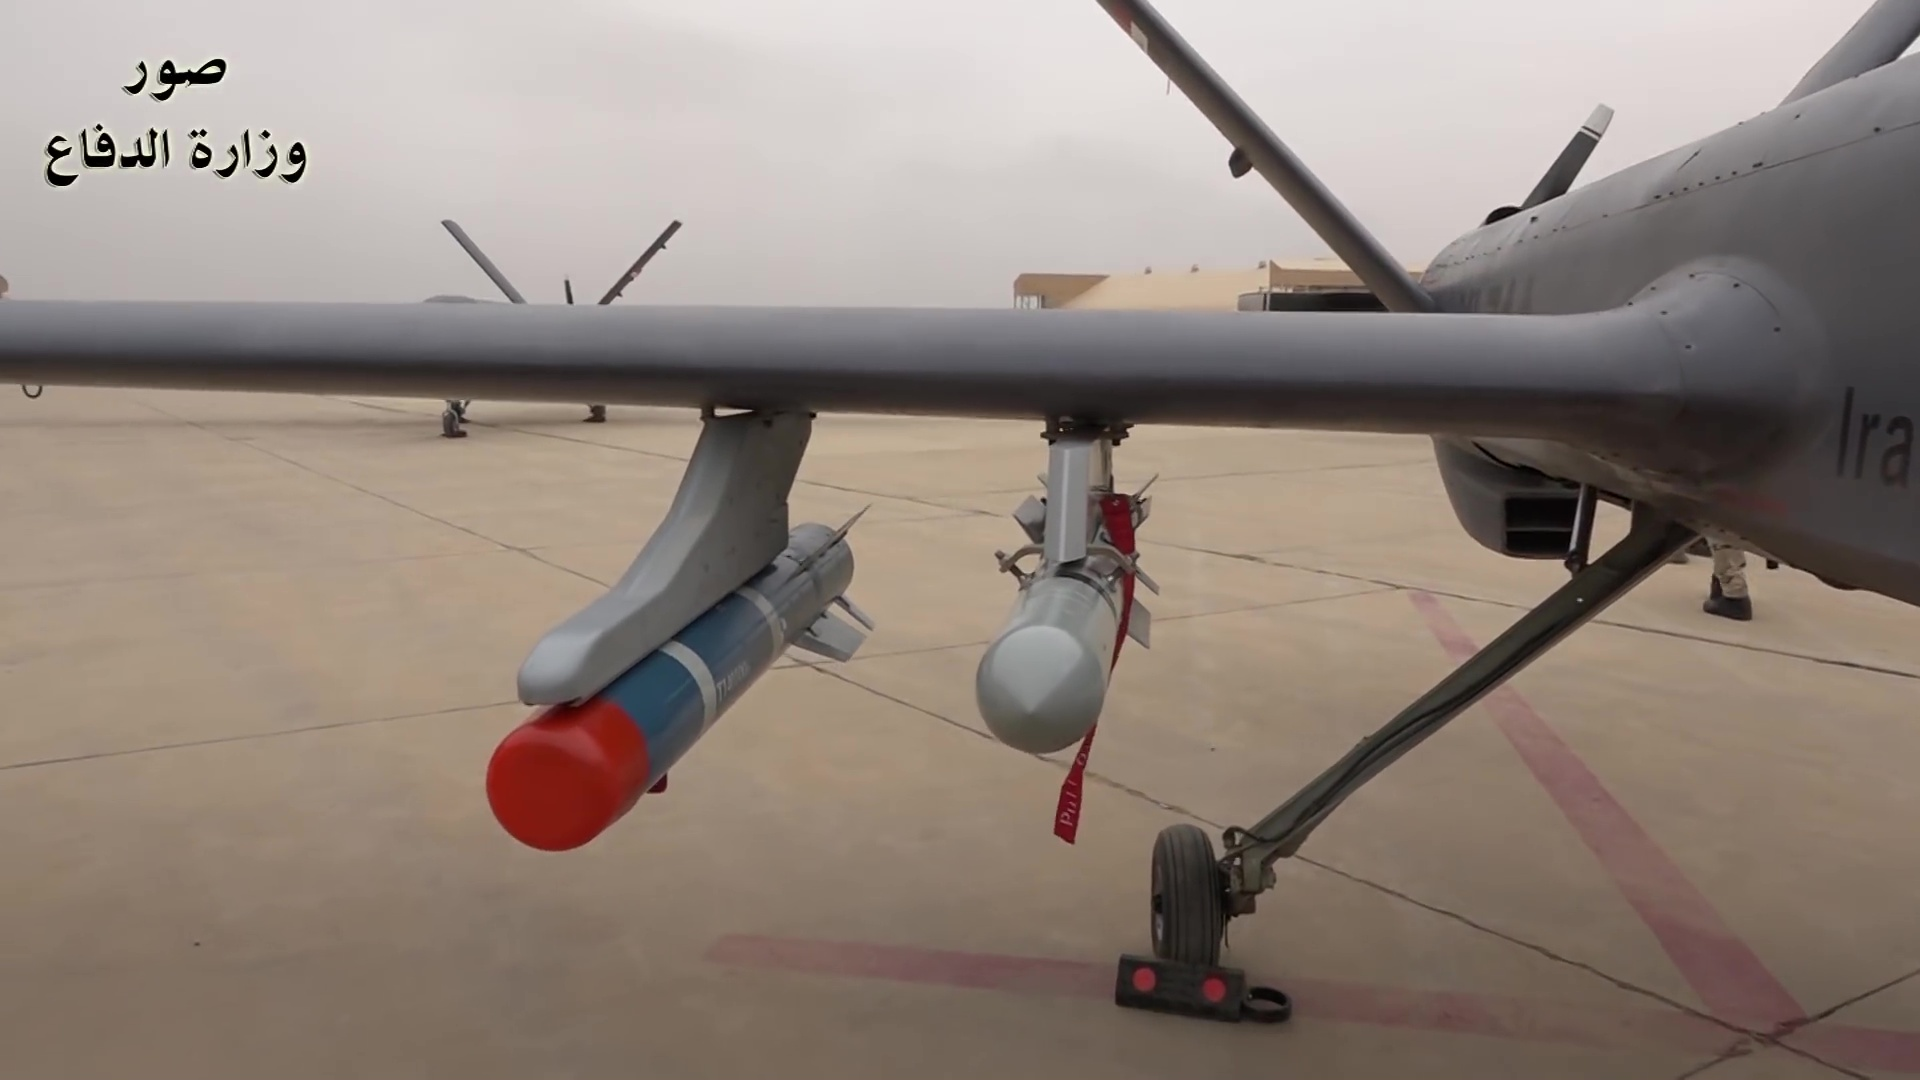 مسابقة رمضان الطائرات دون طيار  2018-02-18-Les-officiers-irakiens-parlent-du-drone-CH-4-05